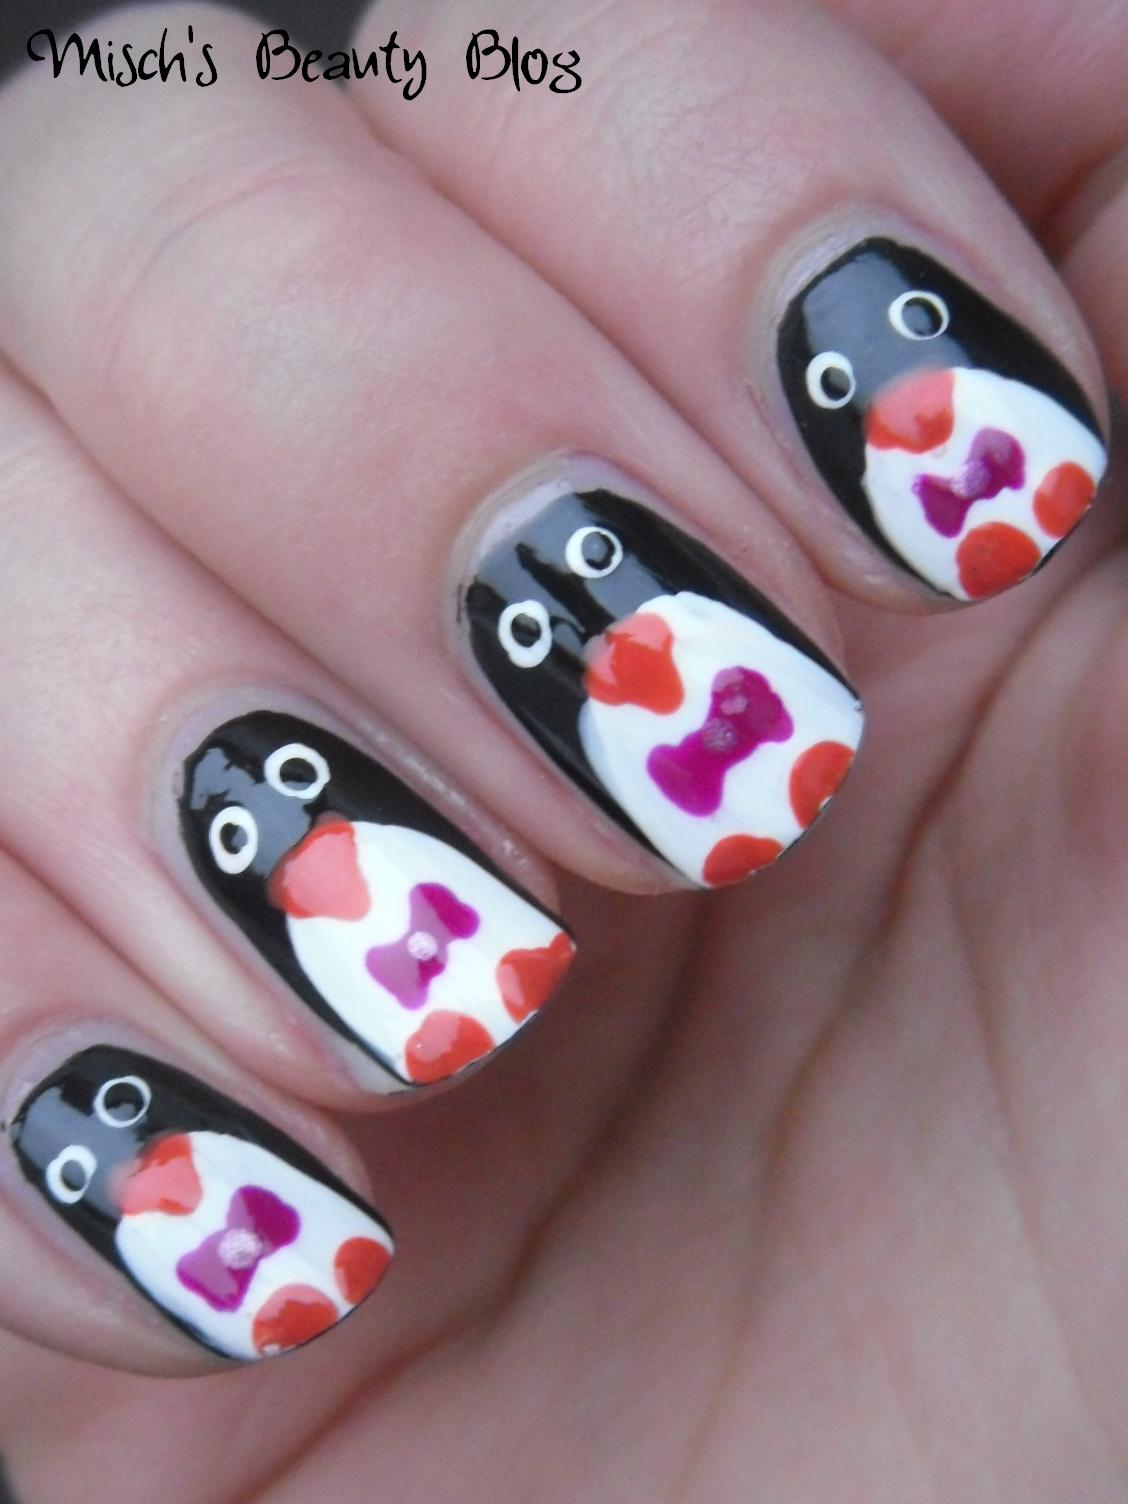 Misch's Beauty Blog: NOTD December 17th: Penguin Nail Art